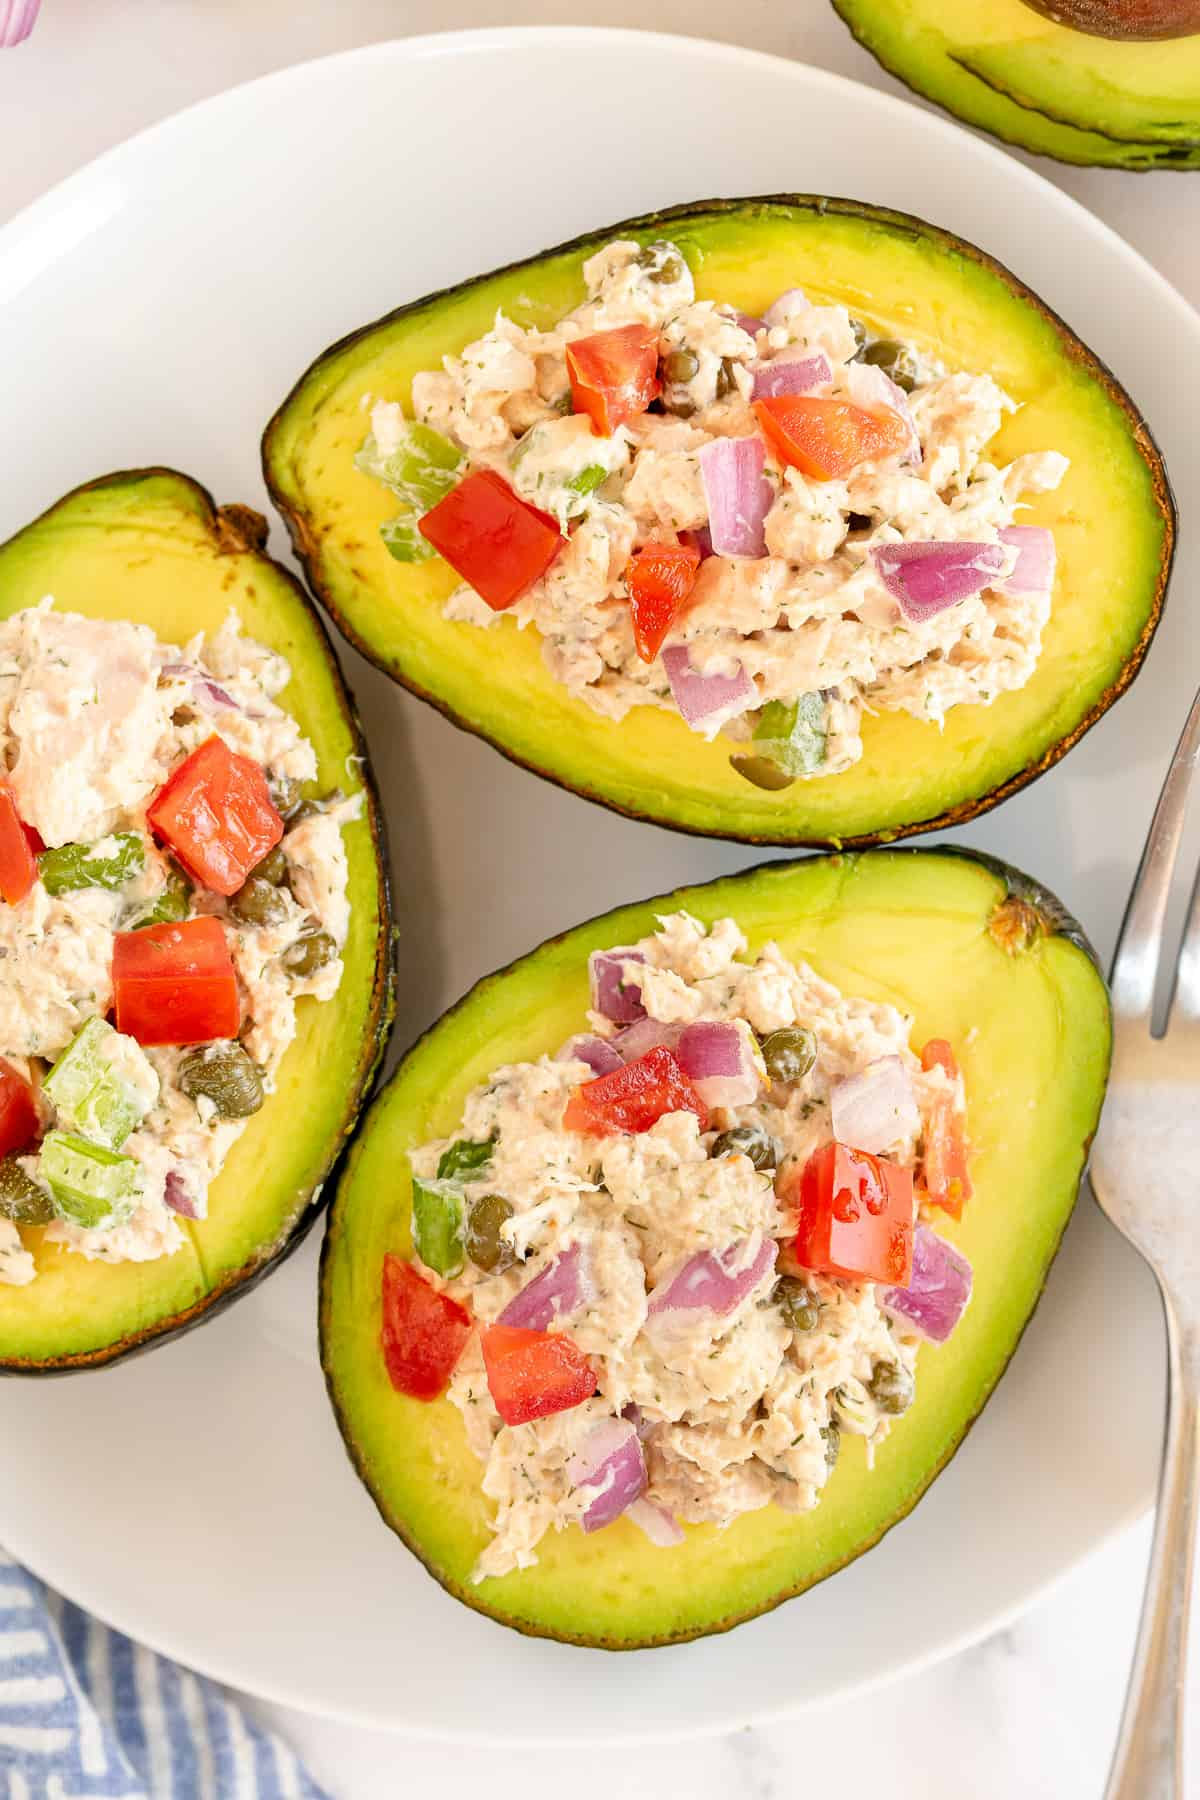 Three avocado halves stuffed with tuna salad.